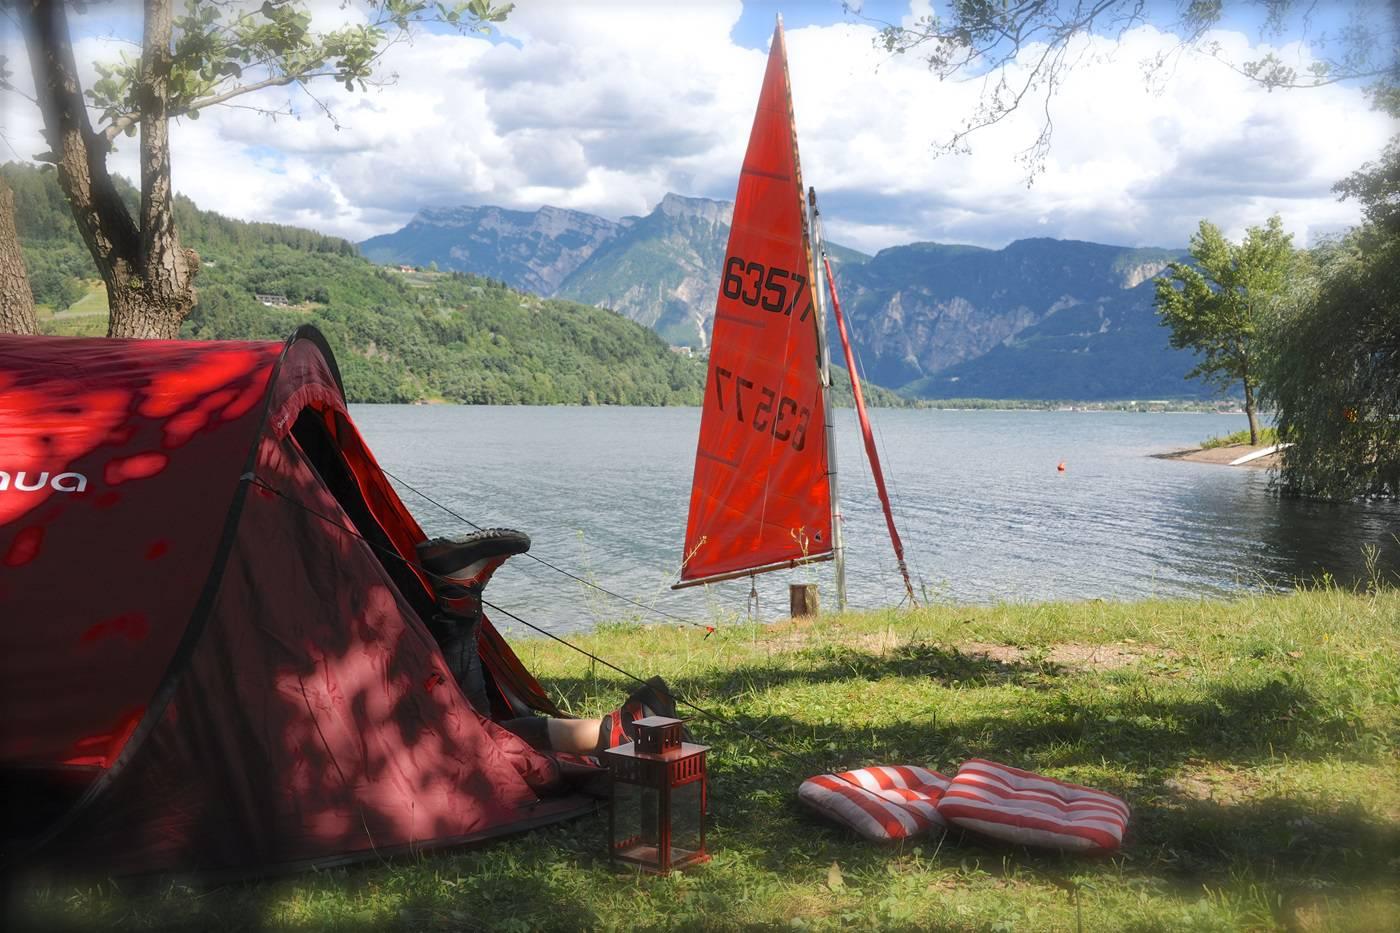 Campeggi in Valsugana, Trentino